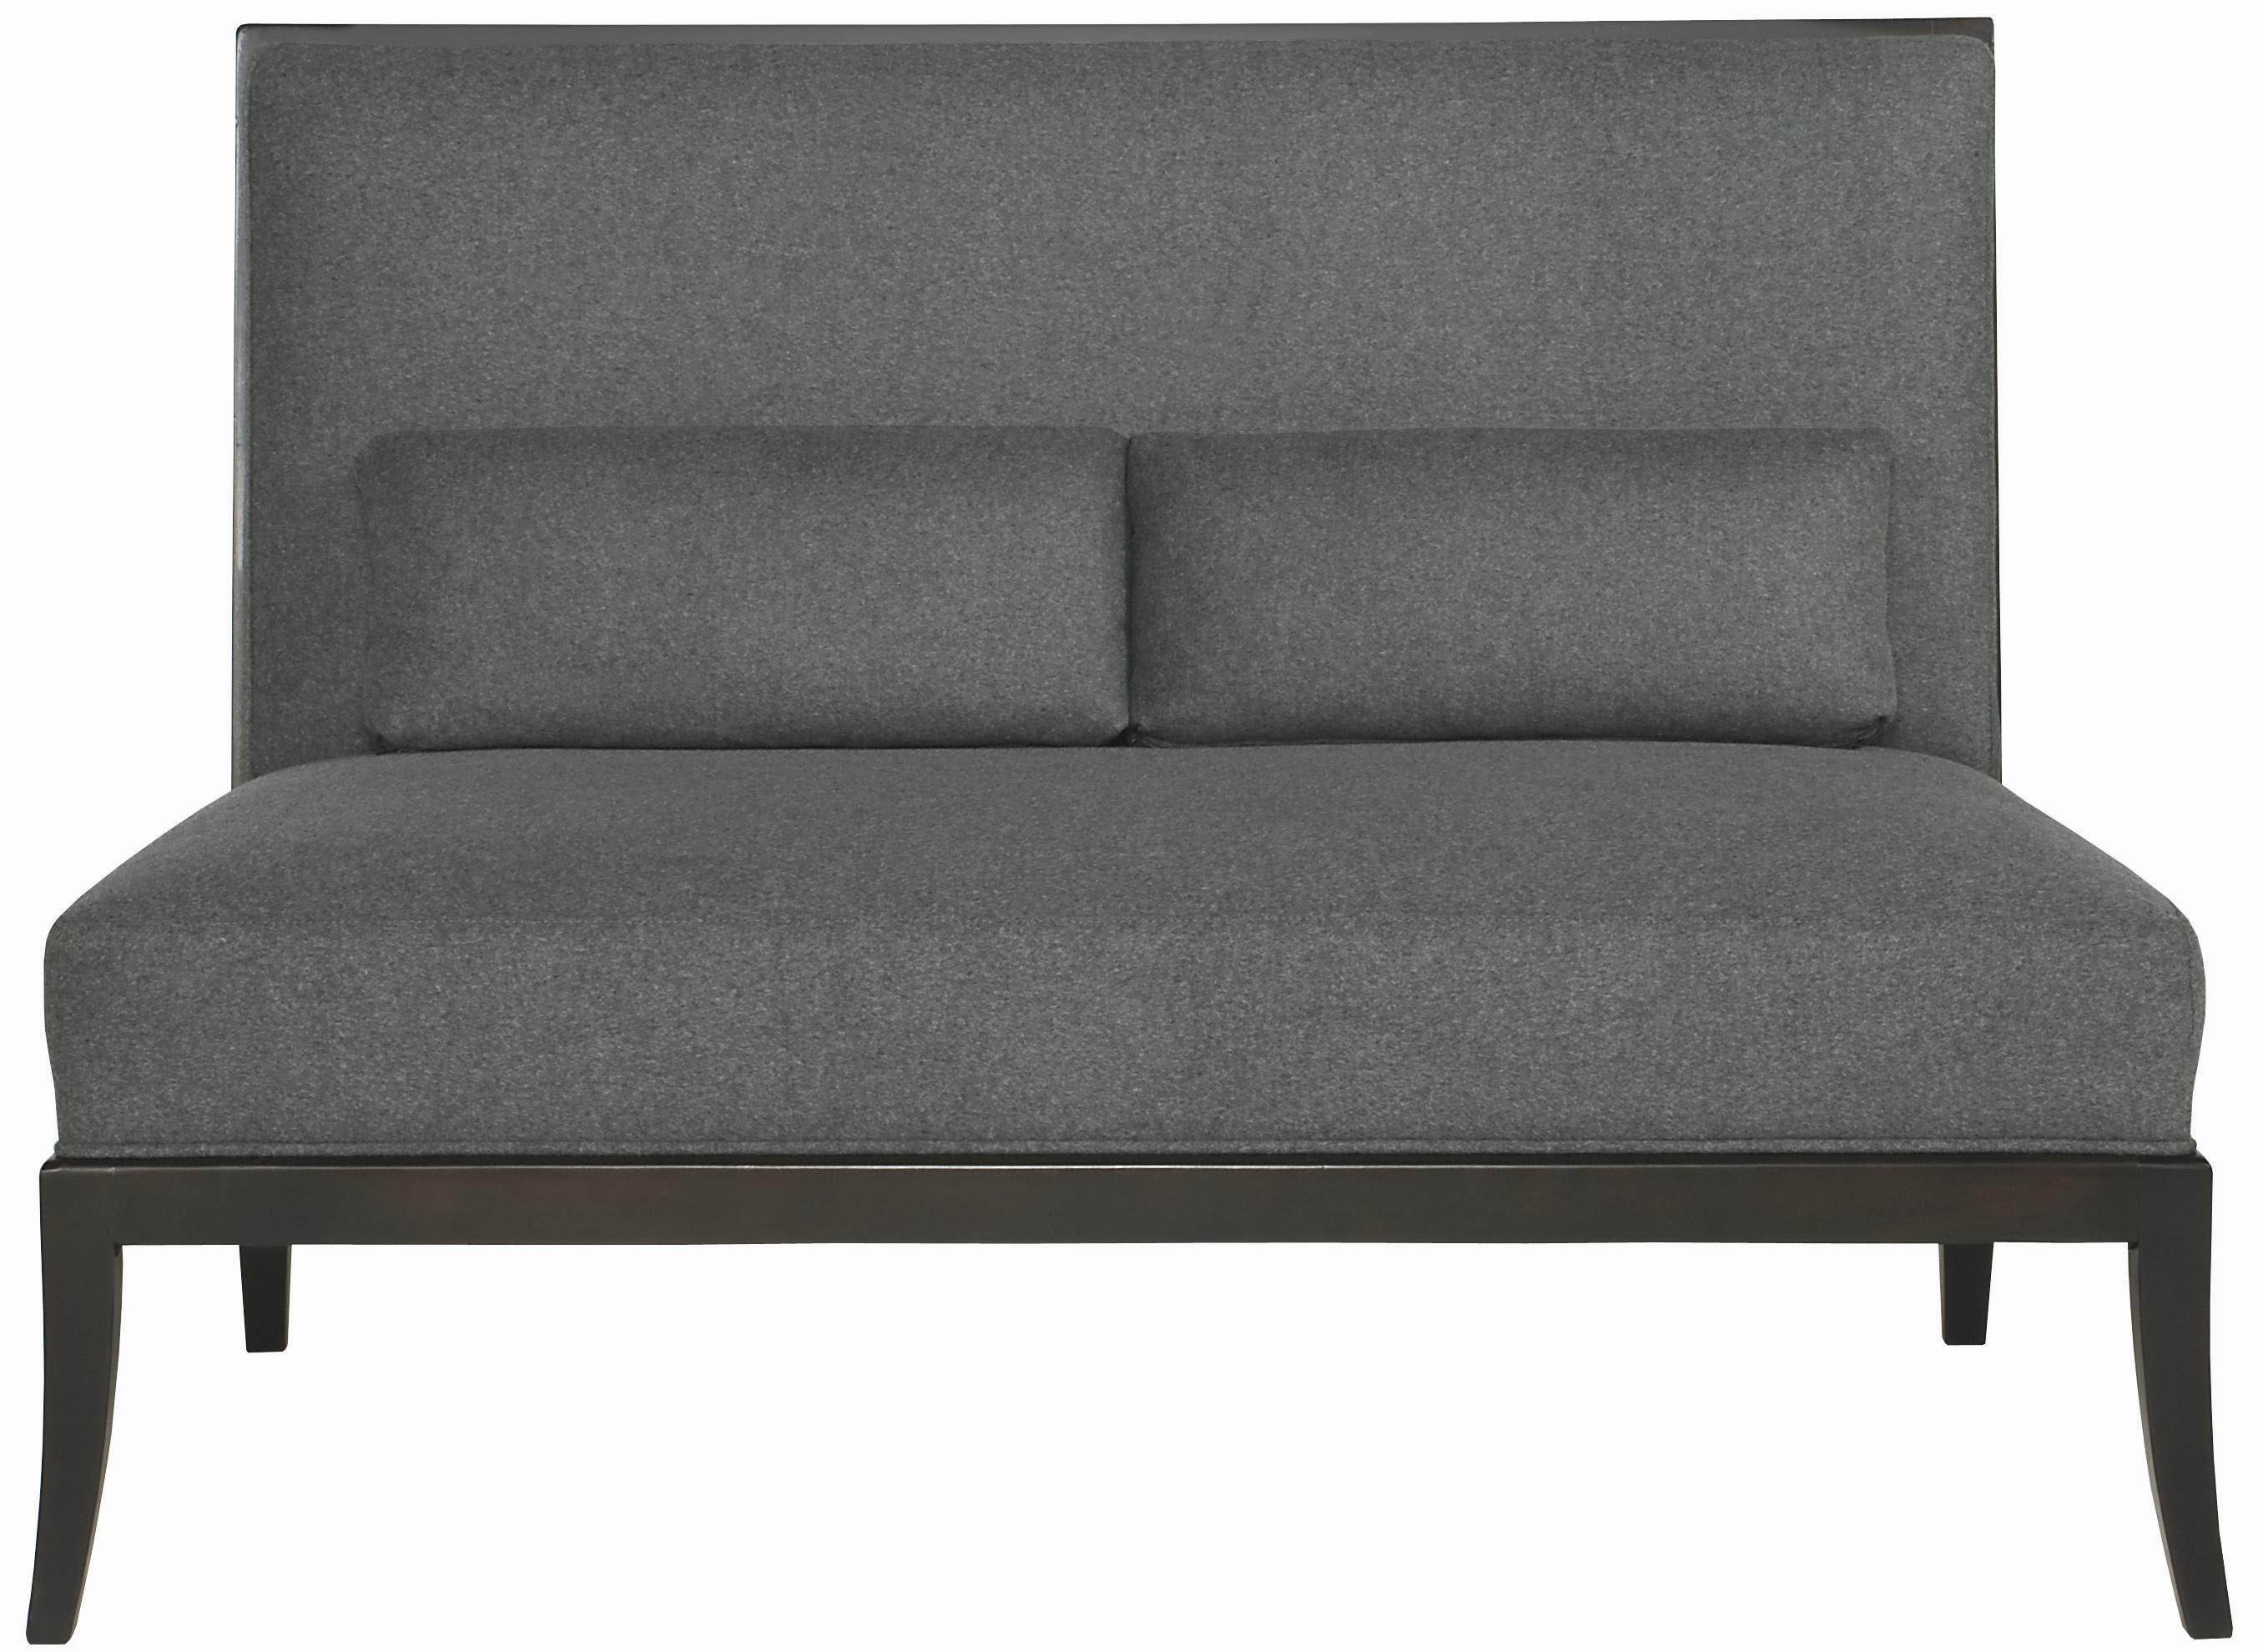 Bernhardt Interiors - Holden Armless Loveseat - John V Schultz Furniture - Love Seat Erie, Pennsylvania